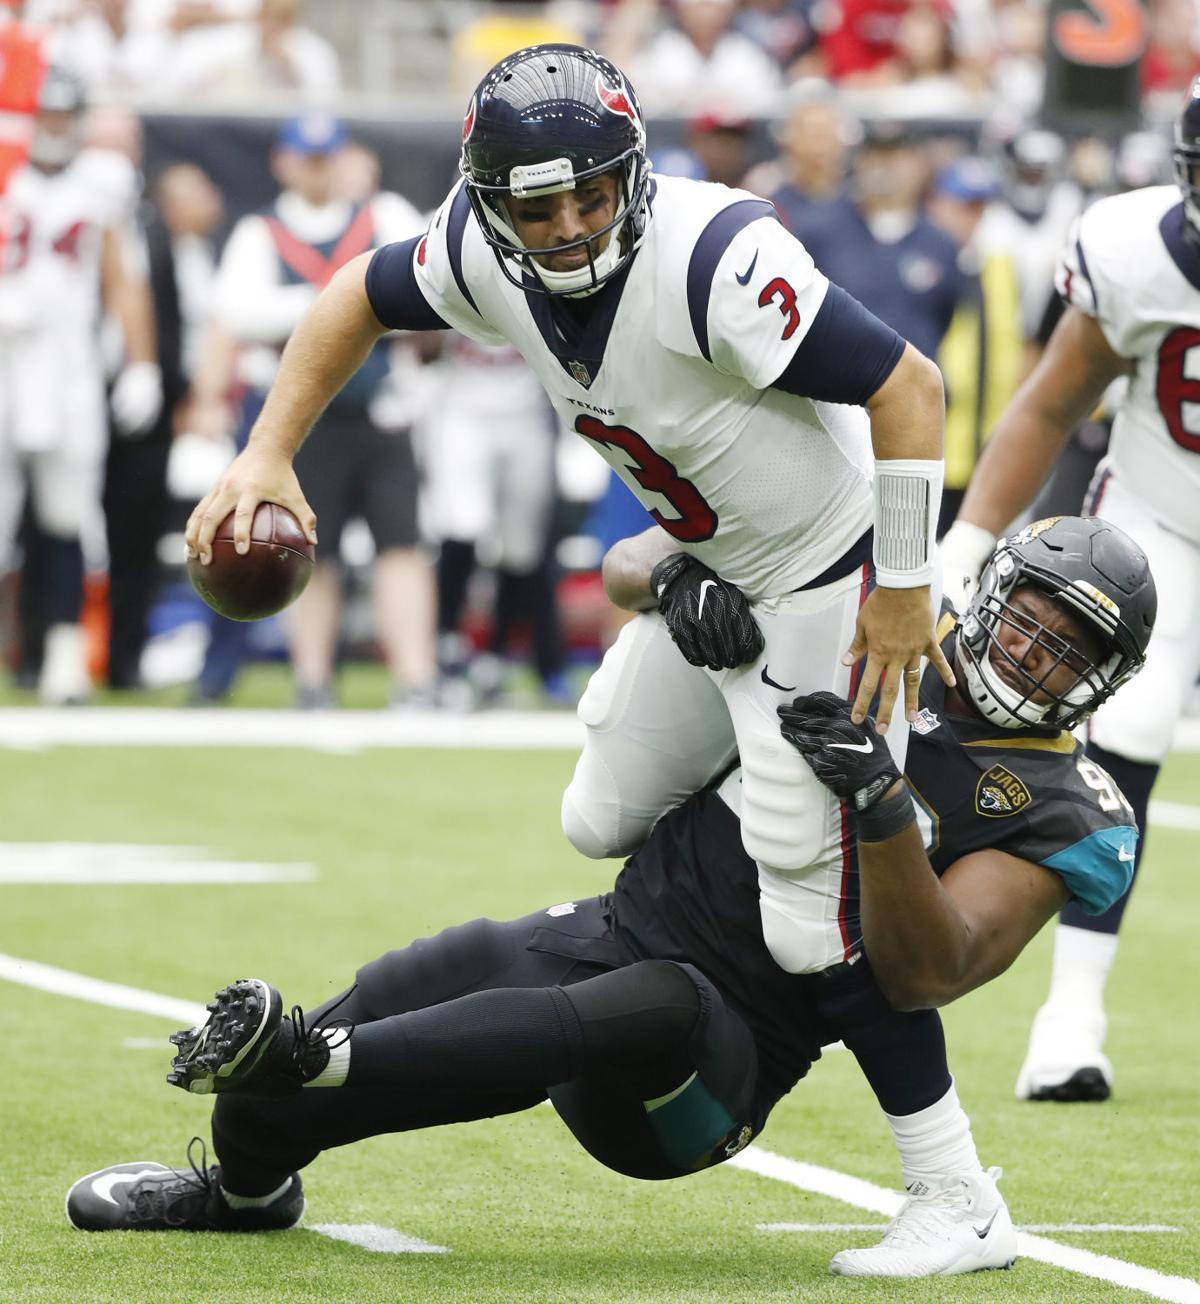 Houston Texans vs. Jacksonville Jaguars